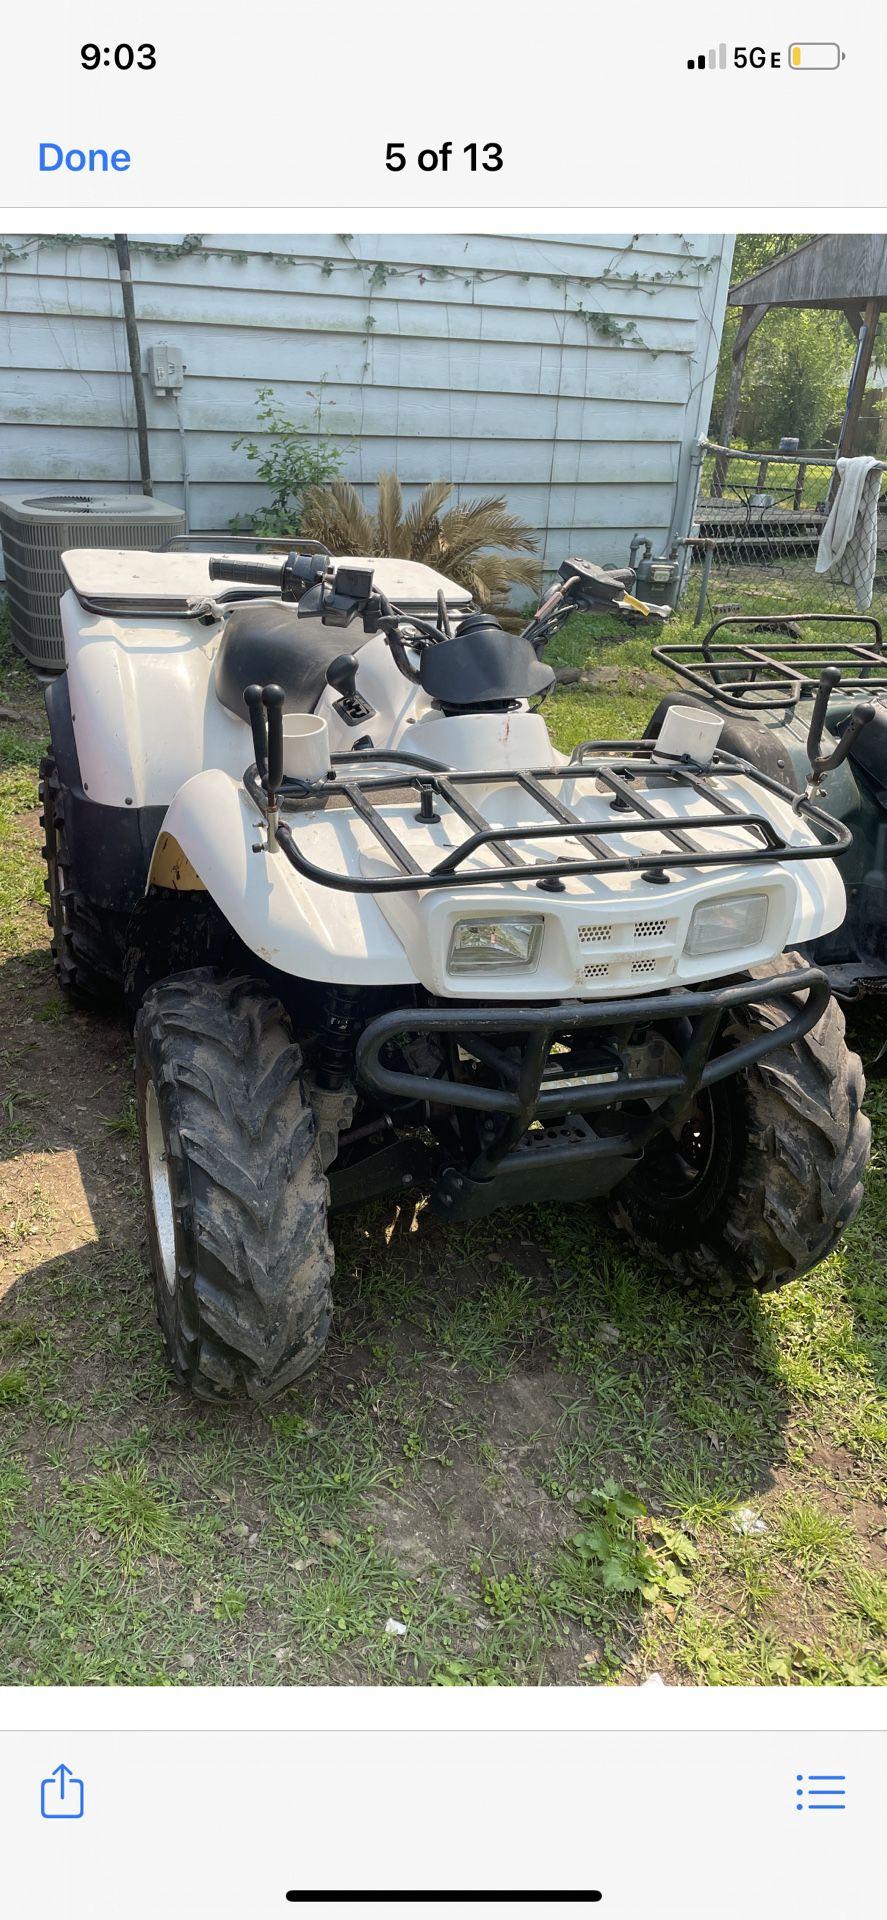 2010 Rzr Ranger 800 And 2008 Kawasaki 360 4x4